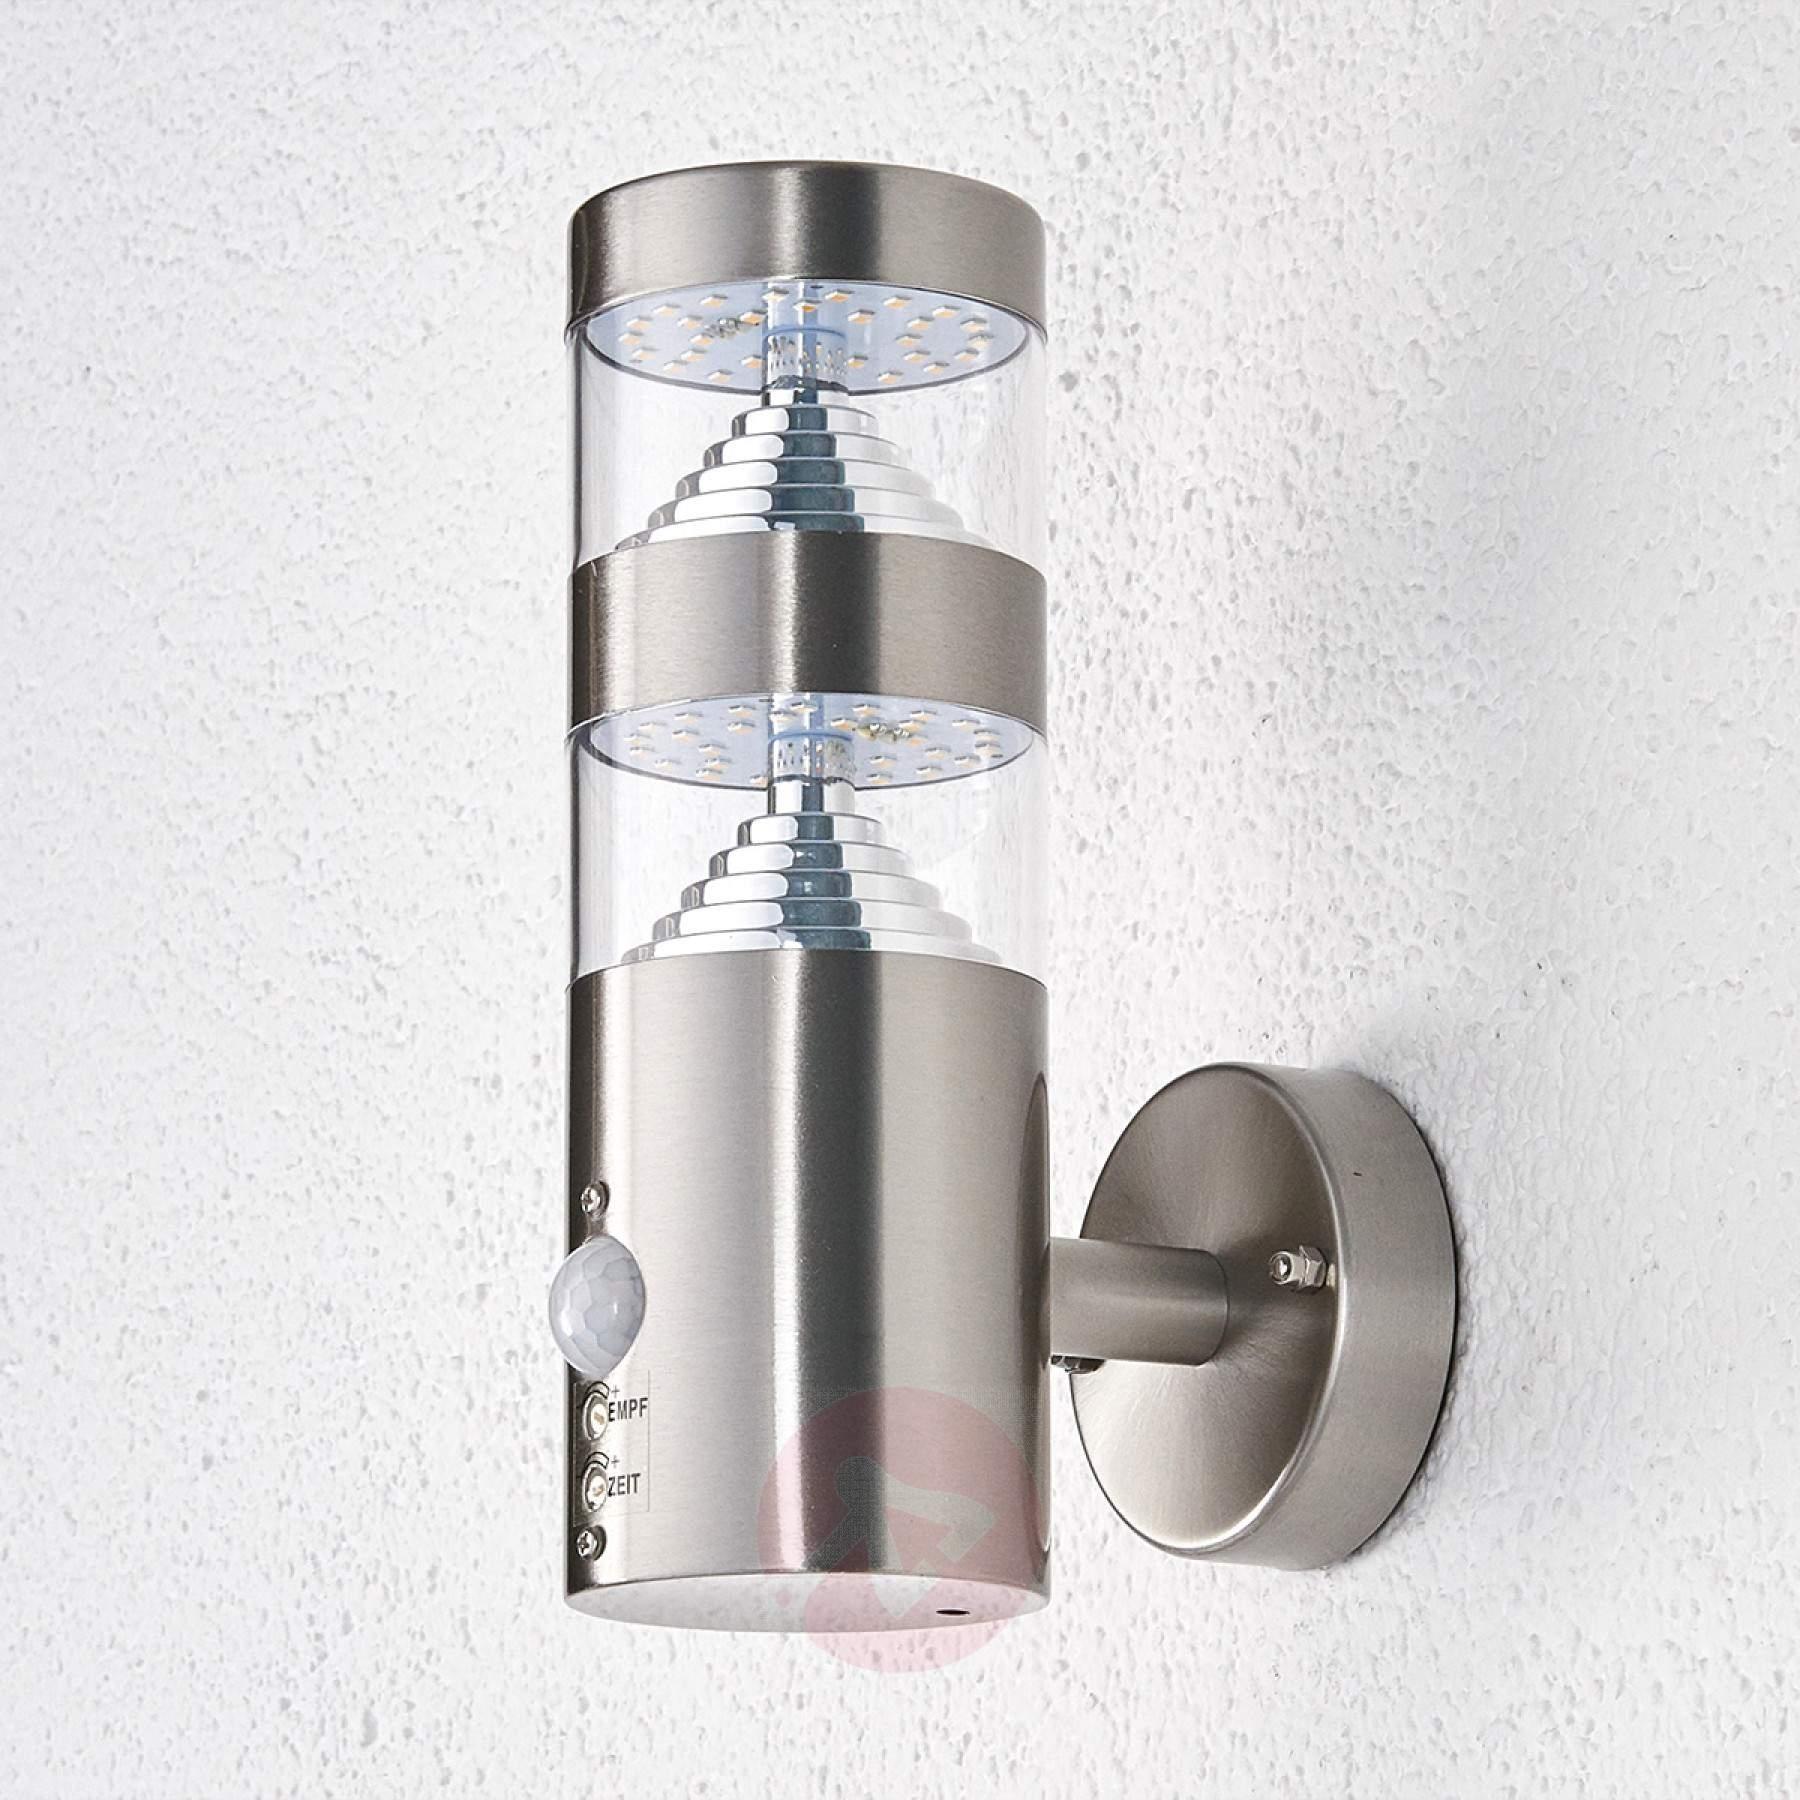 Led Outdoor Wall Light Lanea With Motion Sensor   Lights.co (#9 of 15)